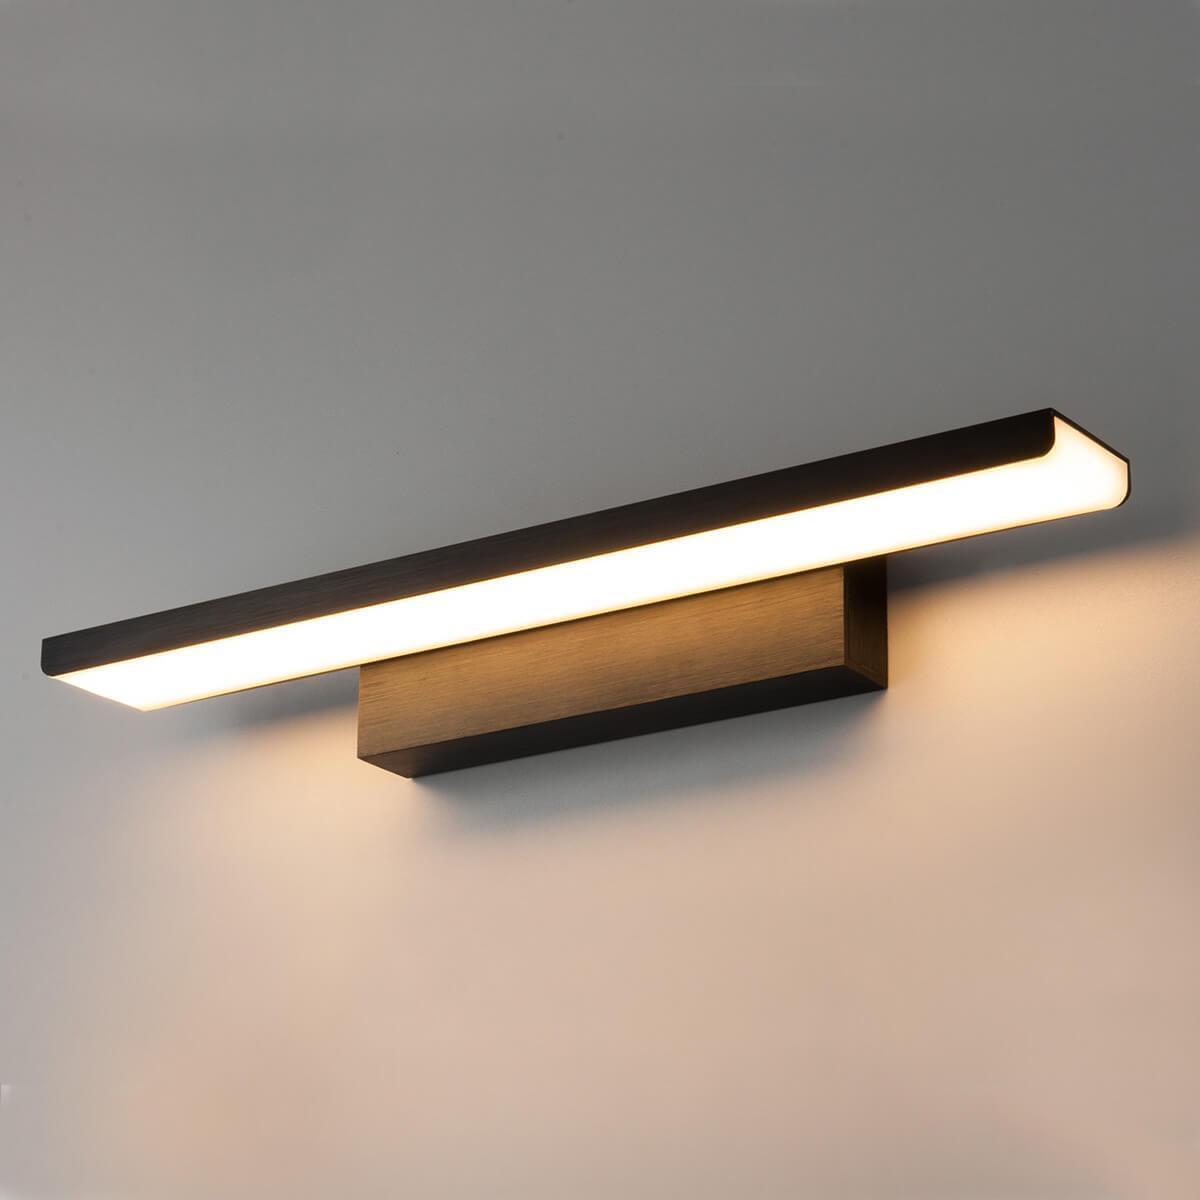 Подсветка для картин Elektrostandard 4690389102790, LED, 16 Вт подсветка для картин elektrostandard sankara led 16w 1009 ip20 черная 4690389102790